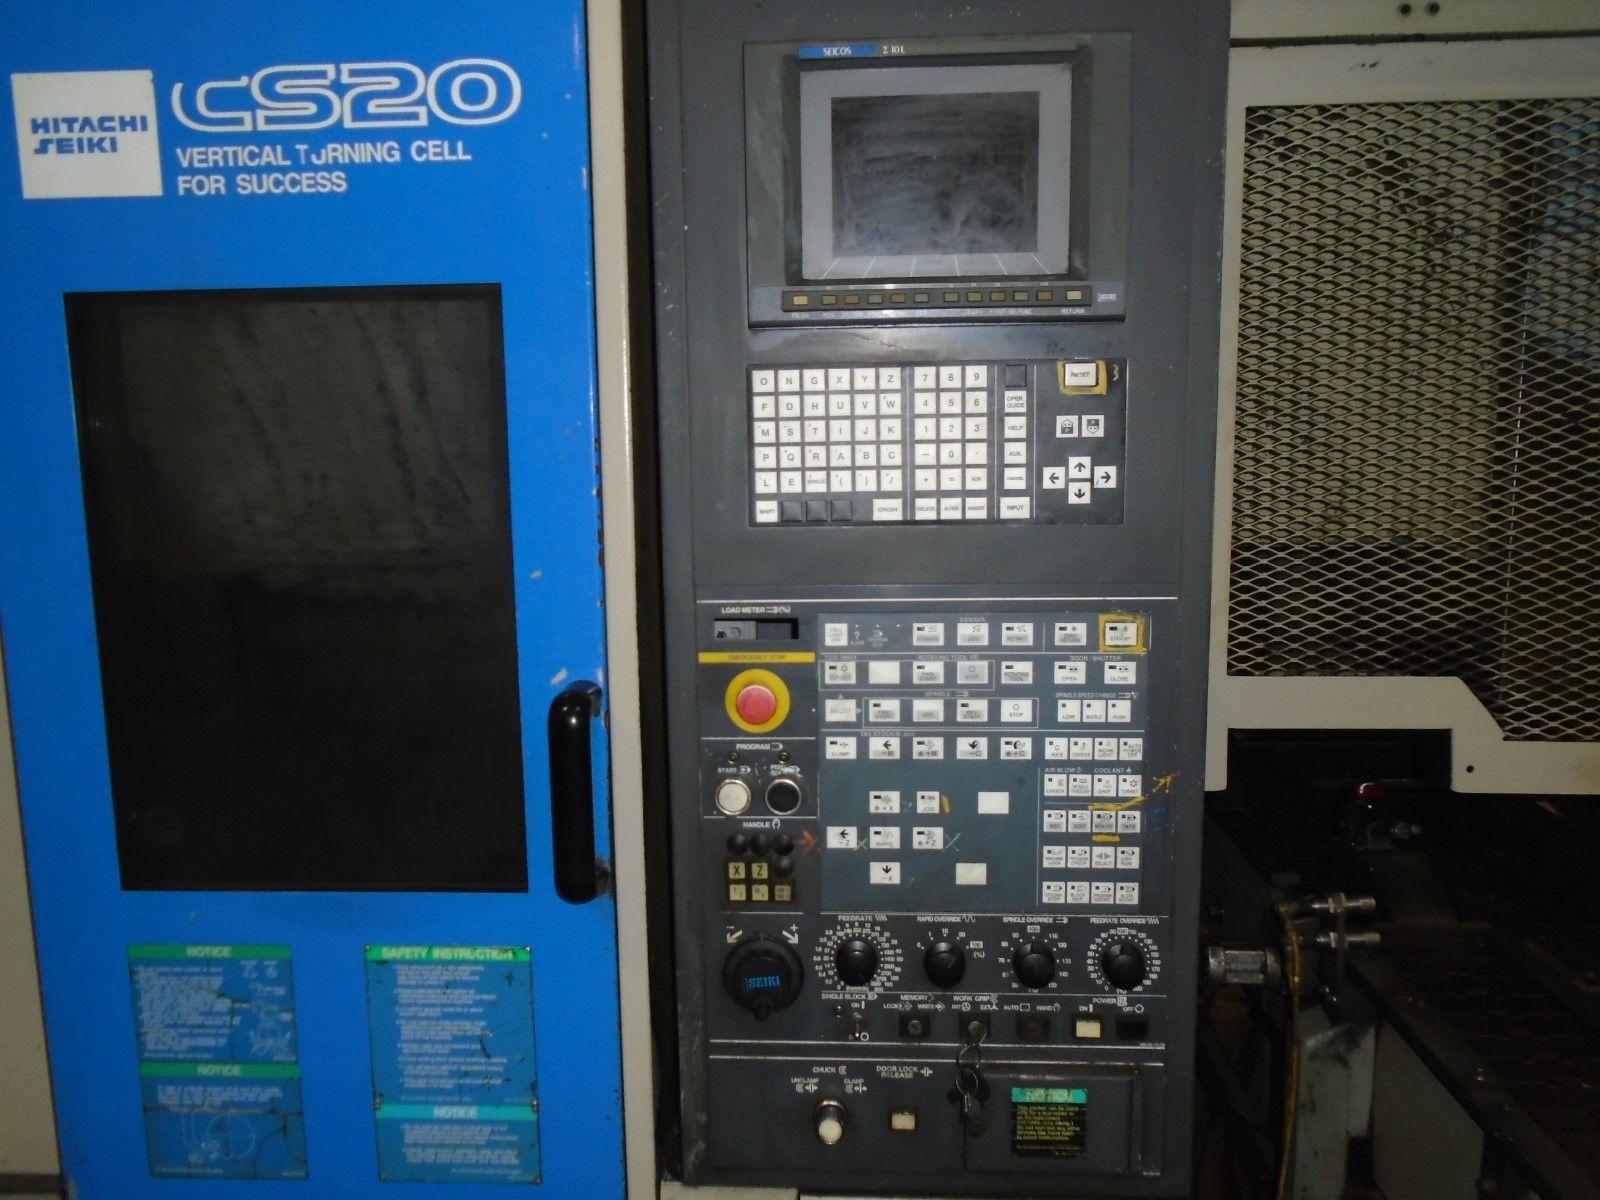 Hitachi Seiki CS20 Vertical CNC Lathe 10L Seicos Control 1998 - Image 7 of 12